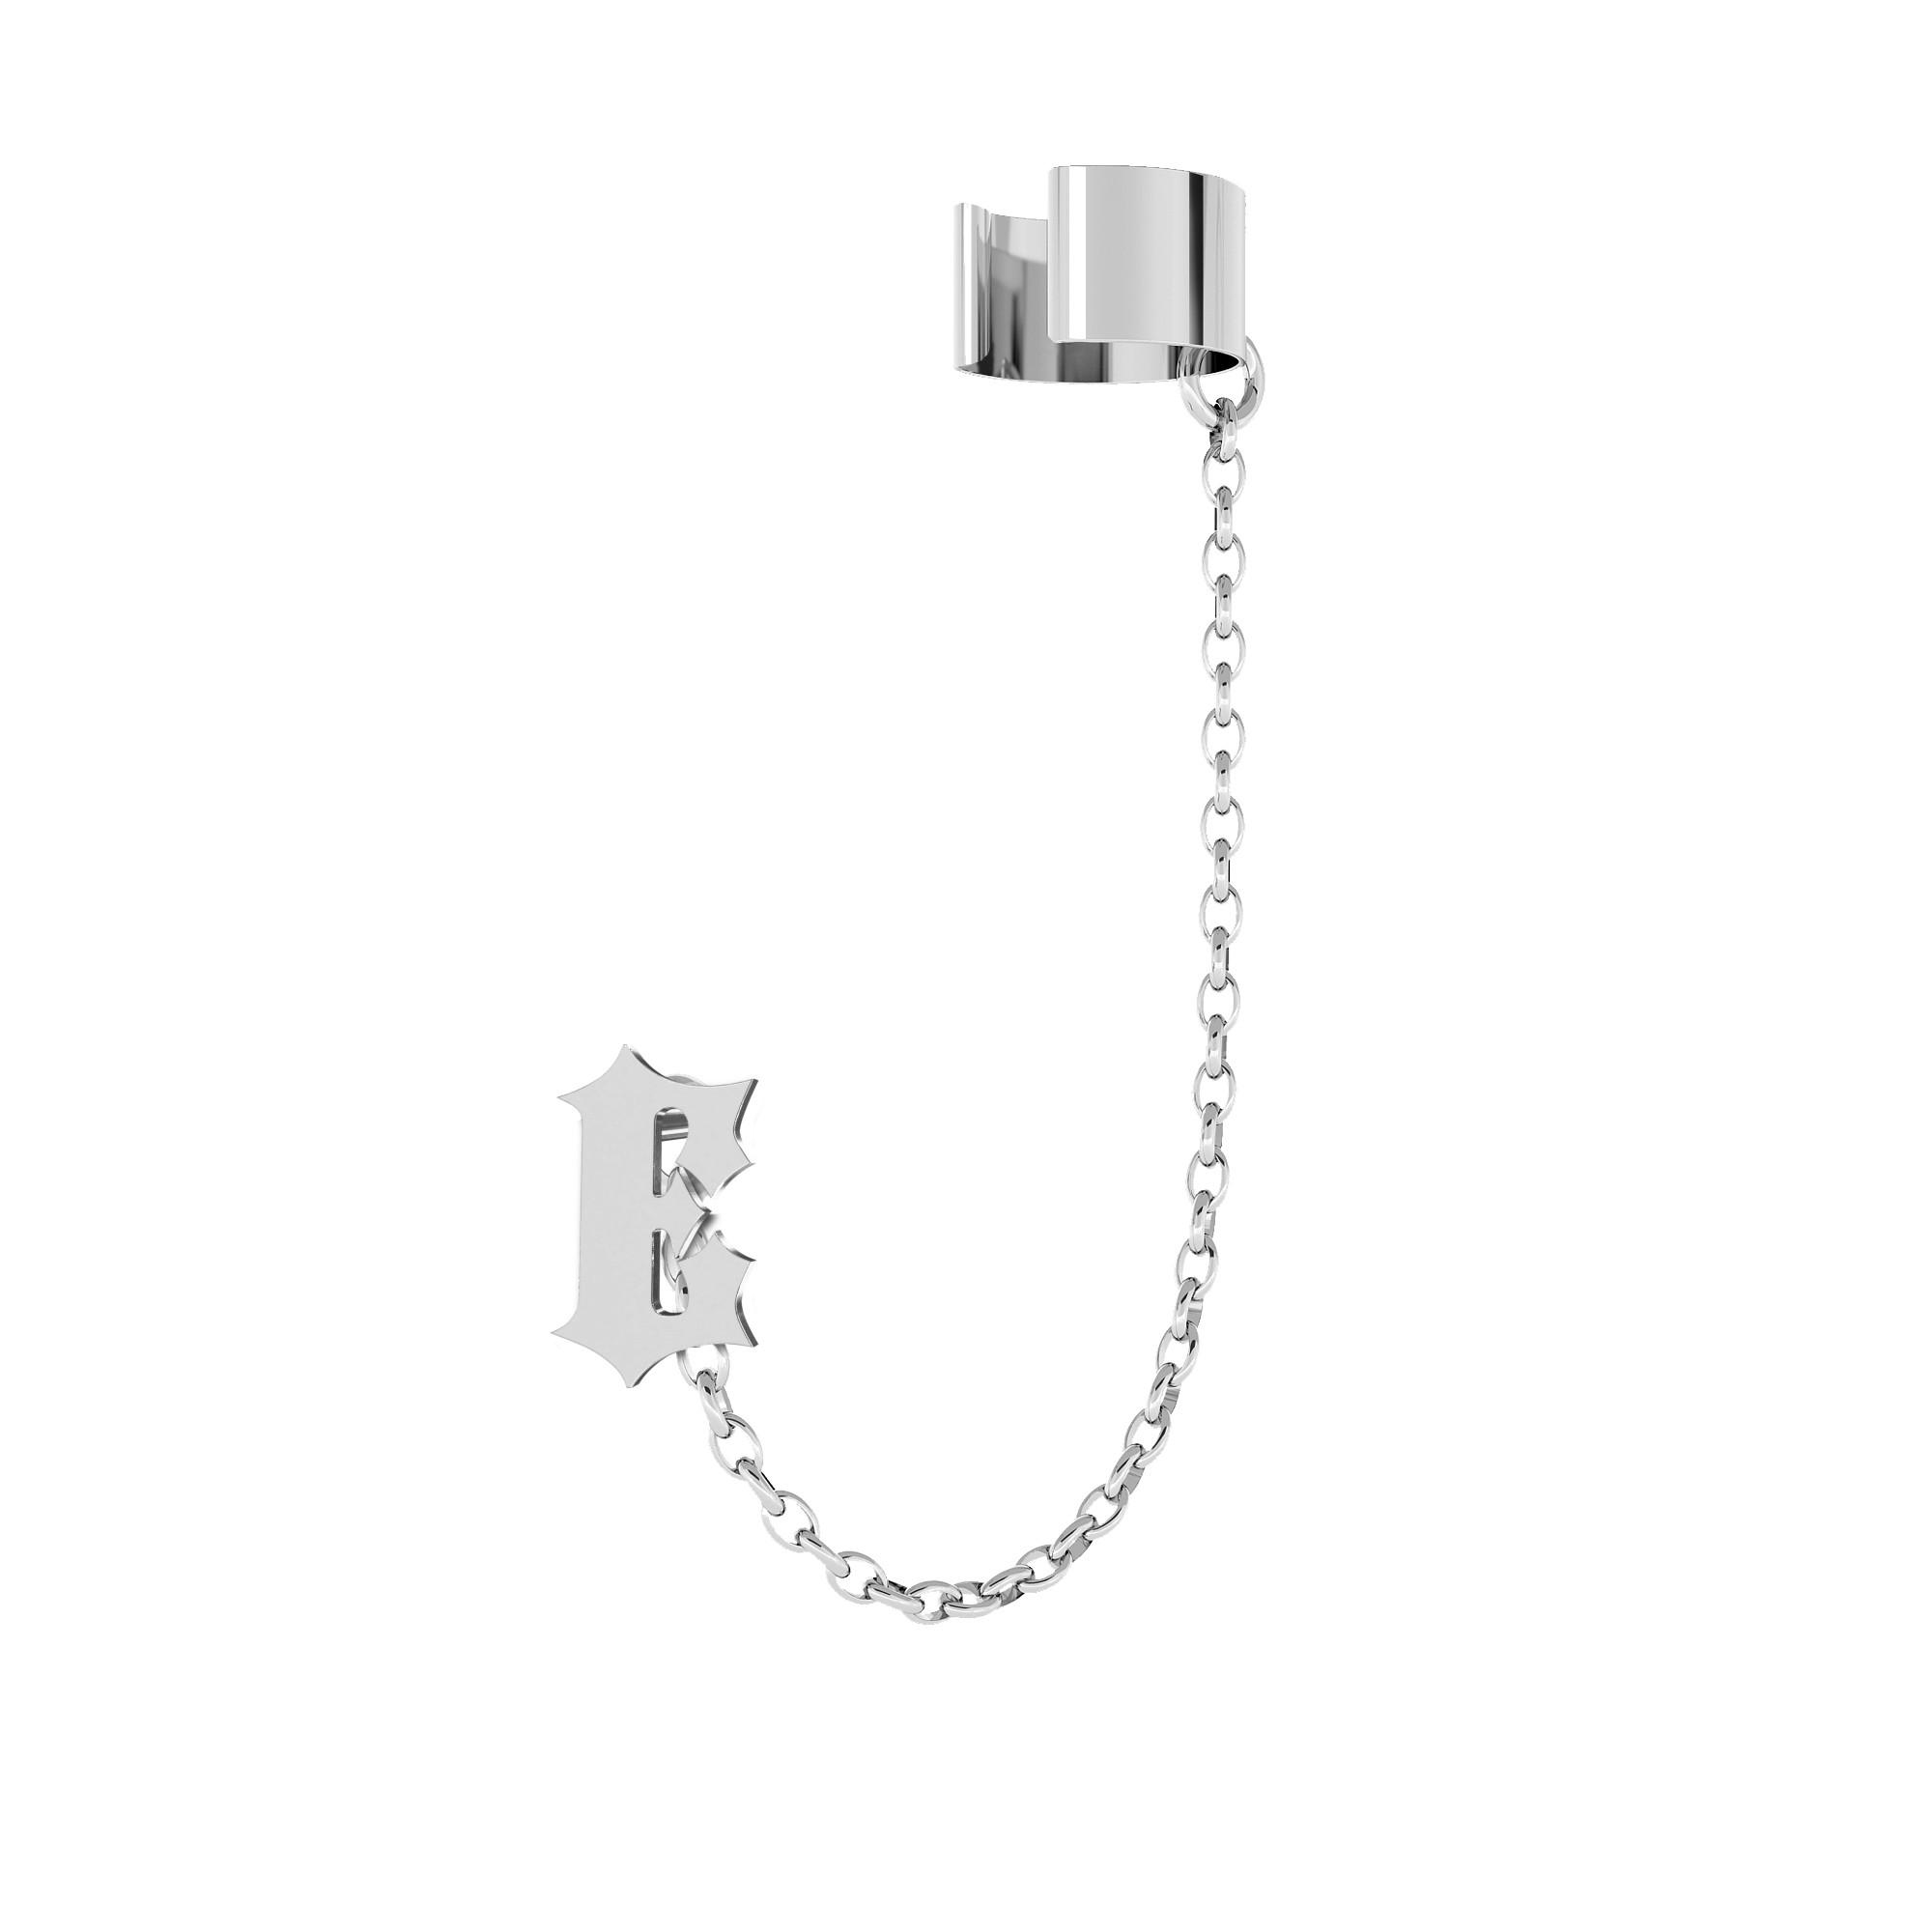 Kolczyk nausznica dowolna litera MON DÉFI, srebro 925